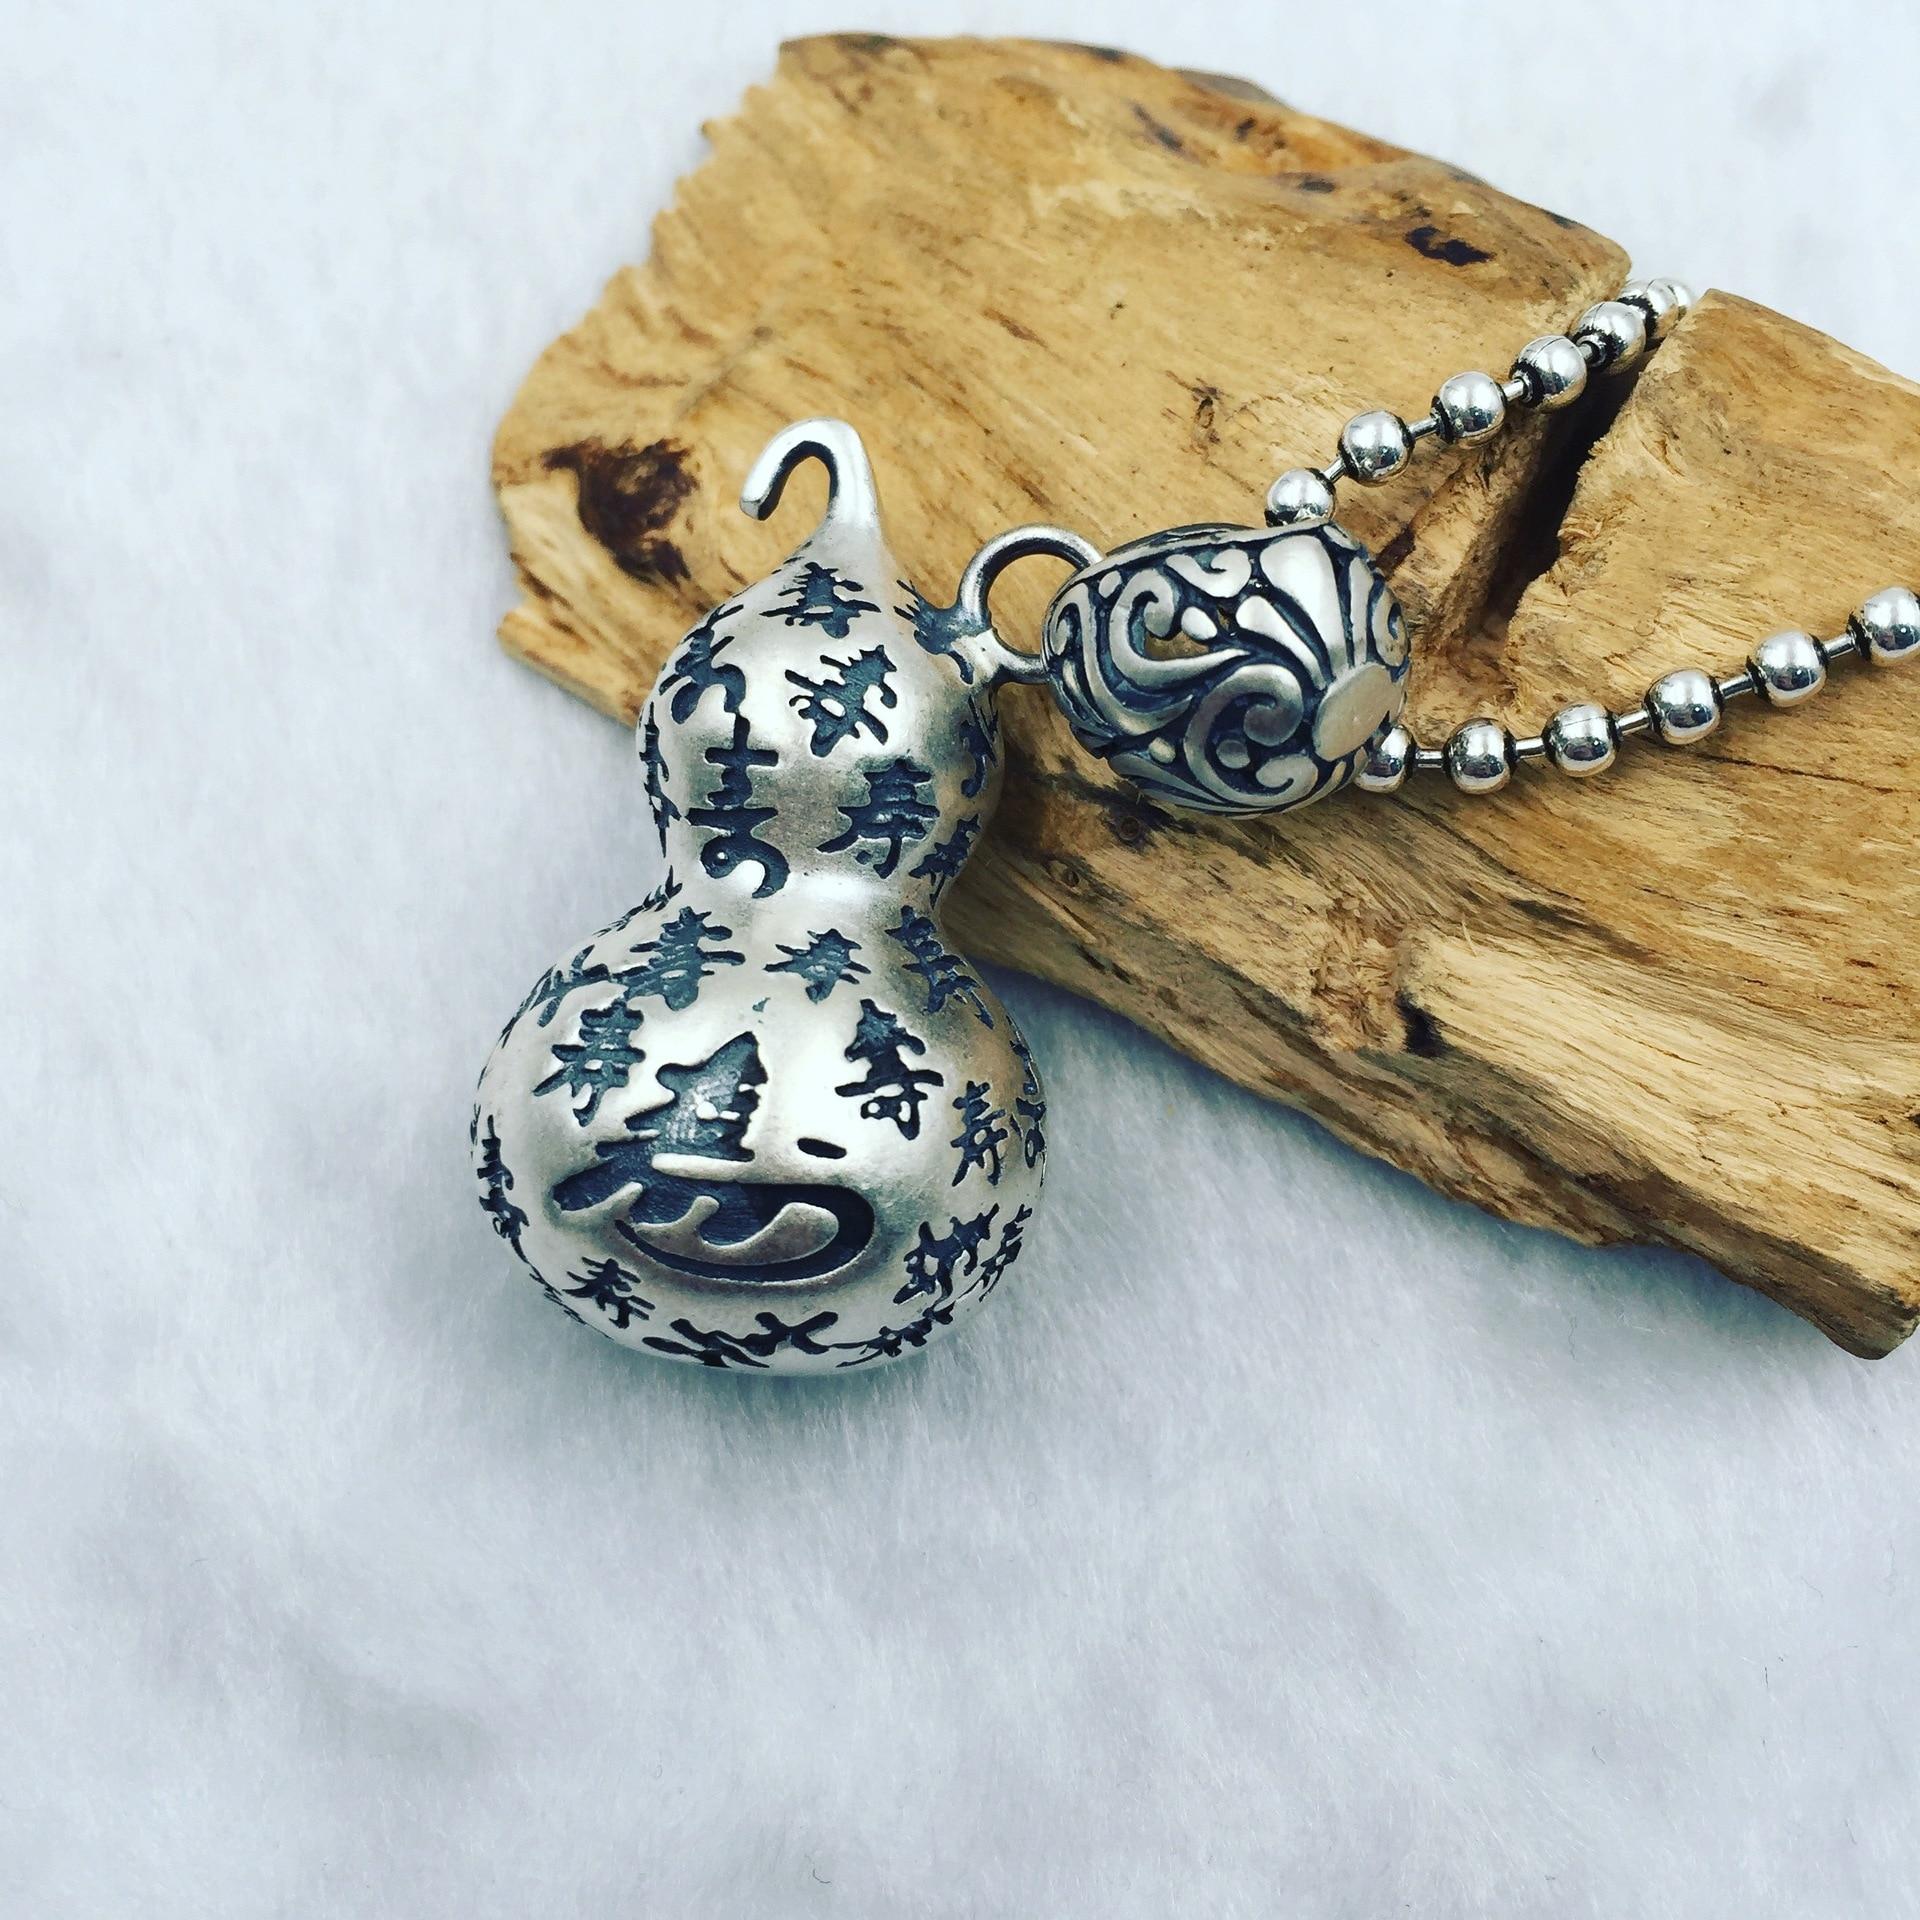 925 Silver Retro Silver Hoist Pendant свинка тигровый глаз 5 см